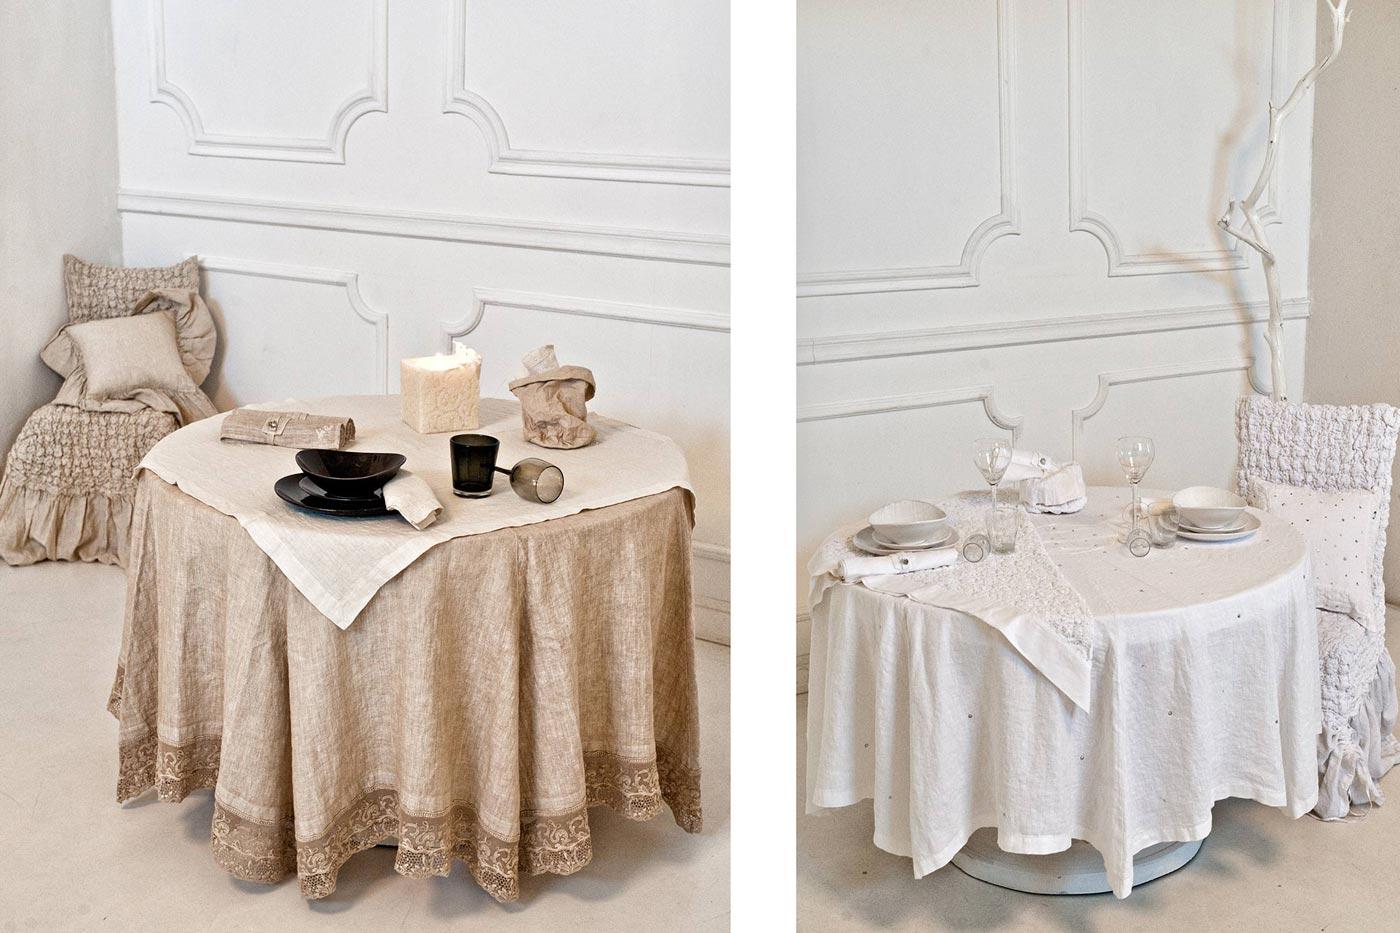 43-arte-pura-table-collection.jpg